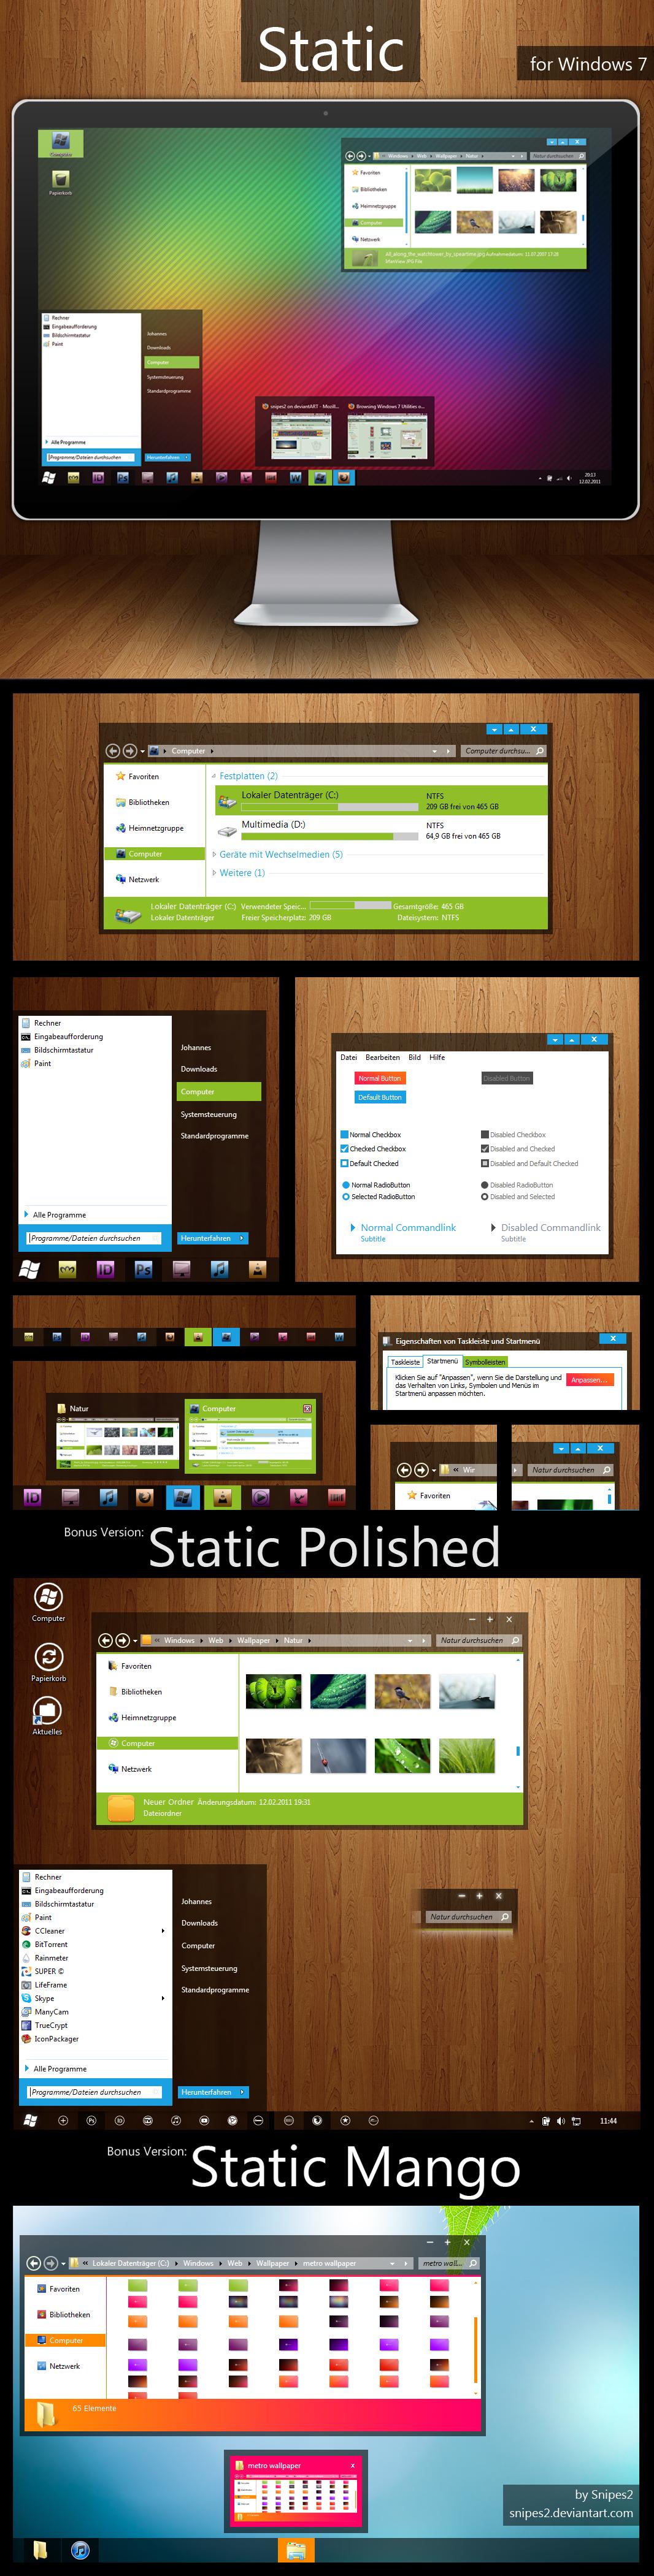 Static + Static Polished + Static Mango